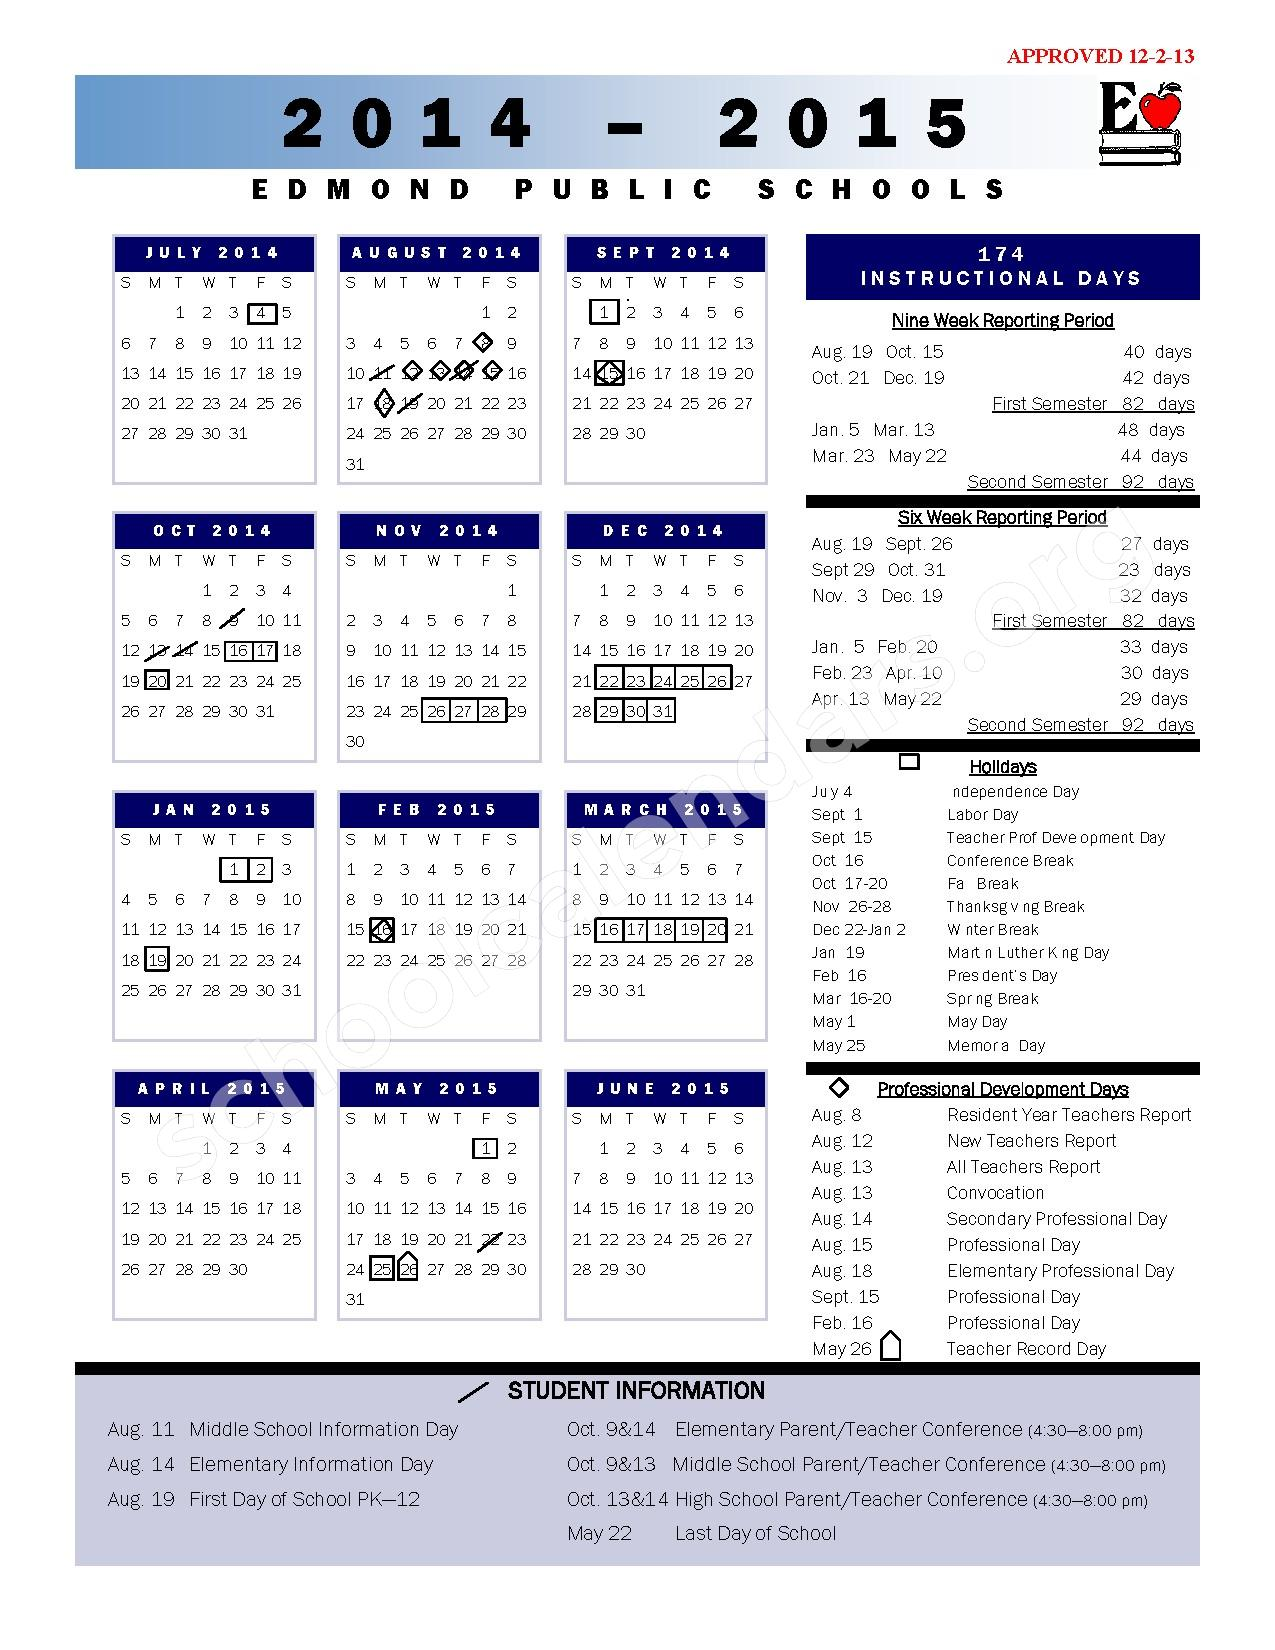 2014 - 2015 School Calendar | Sunset Elementary School – Edmond, OK